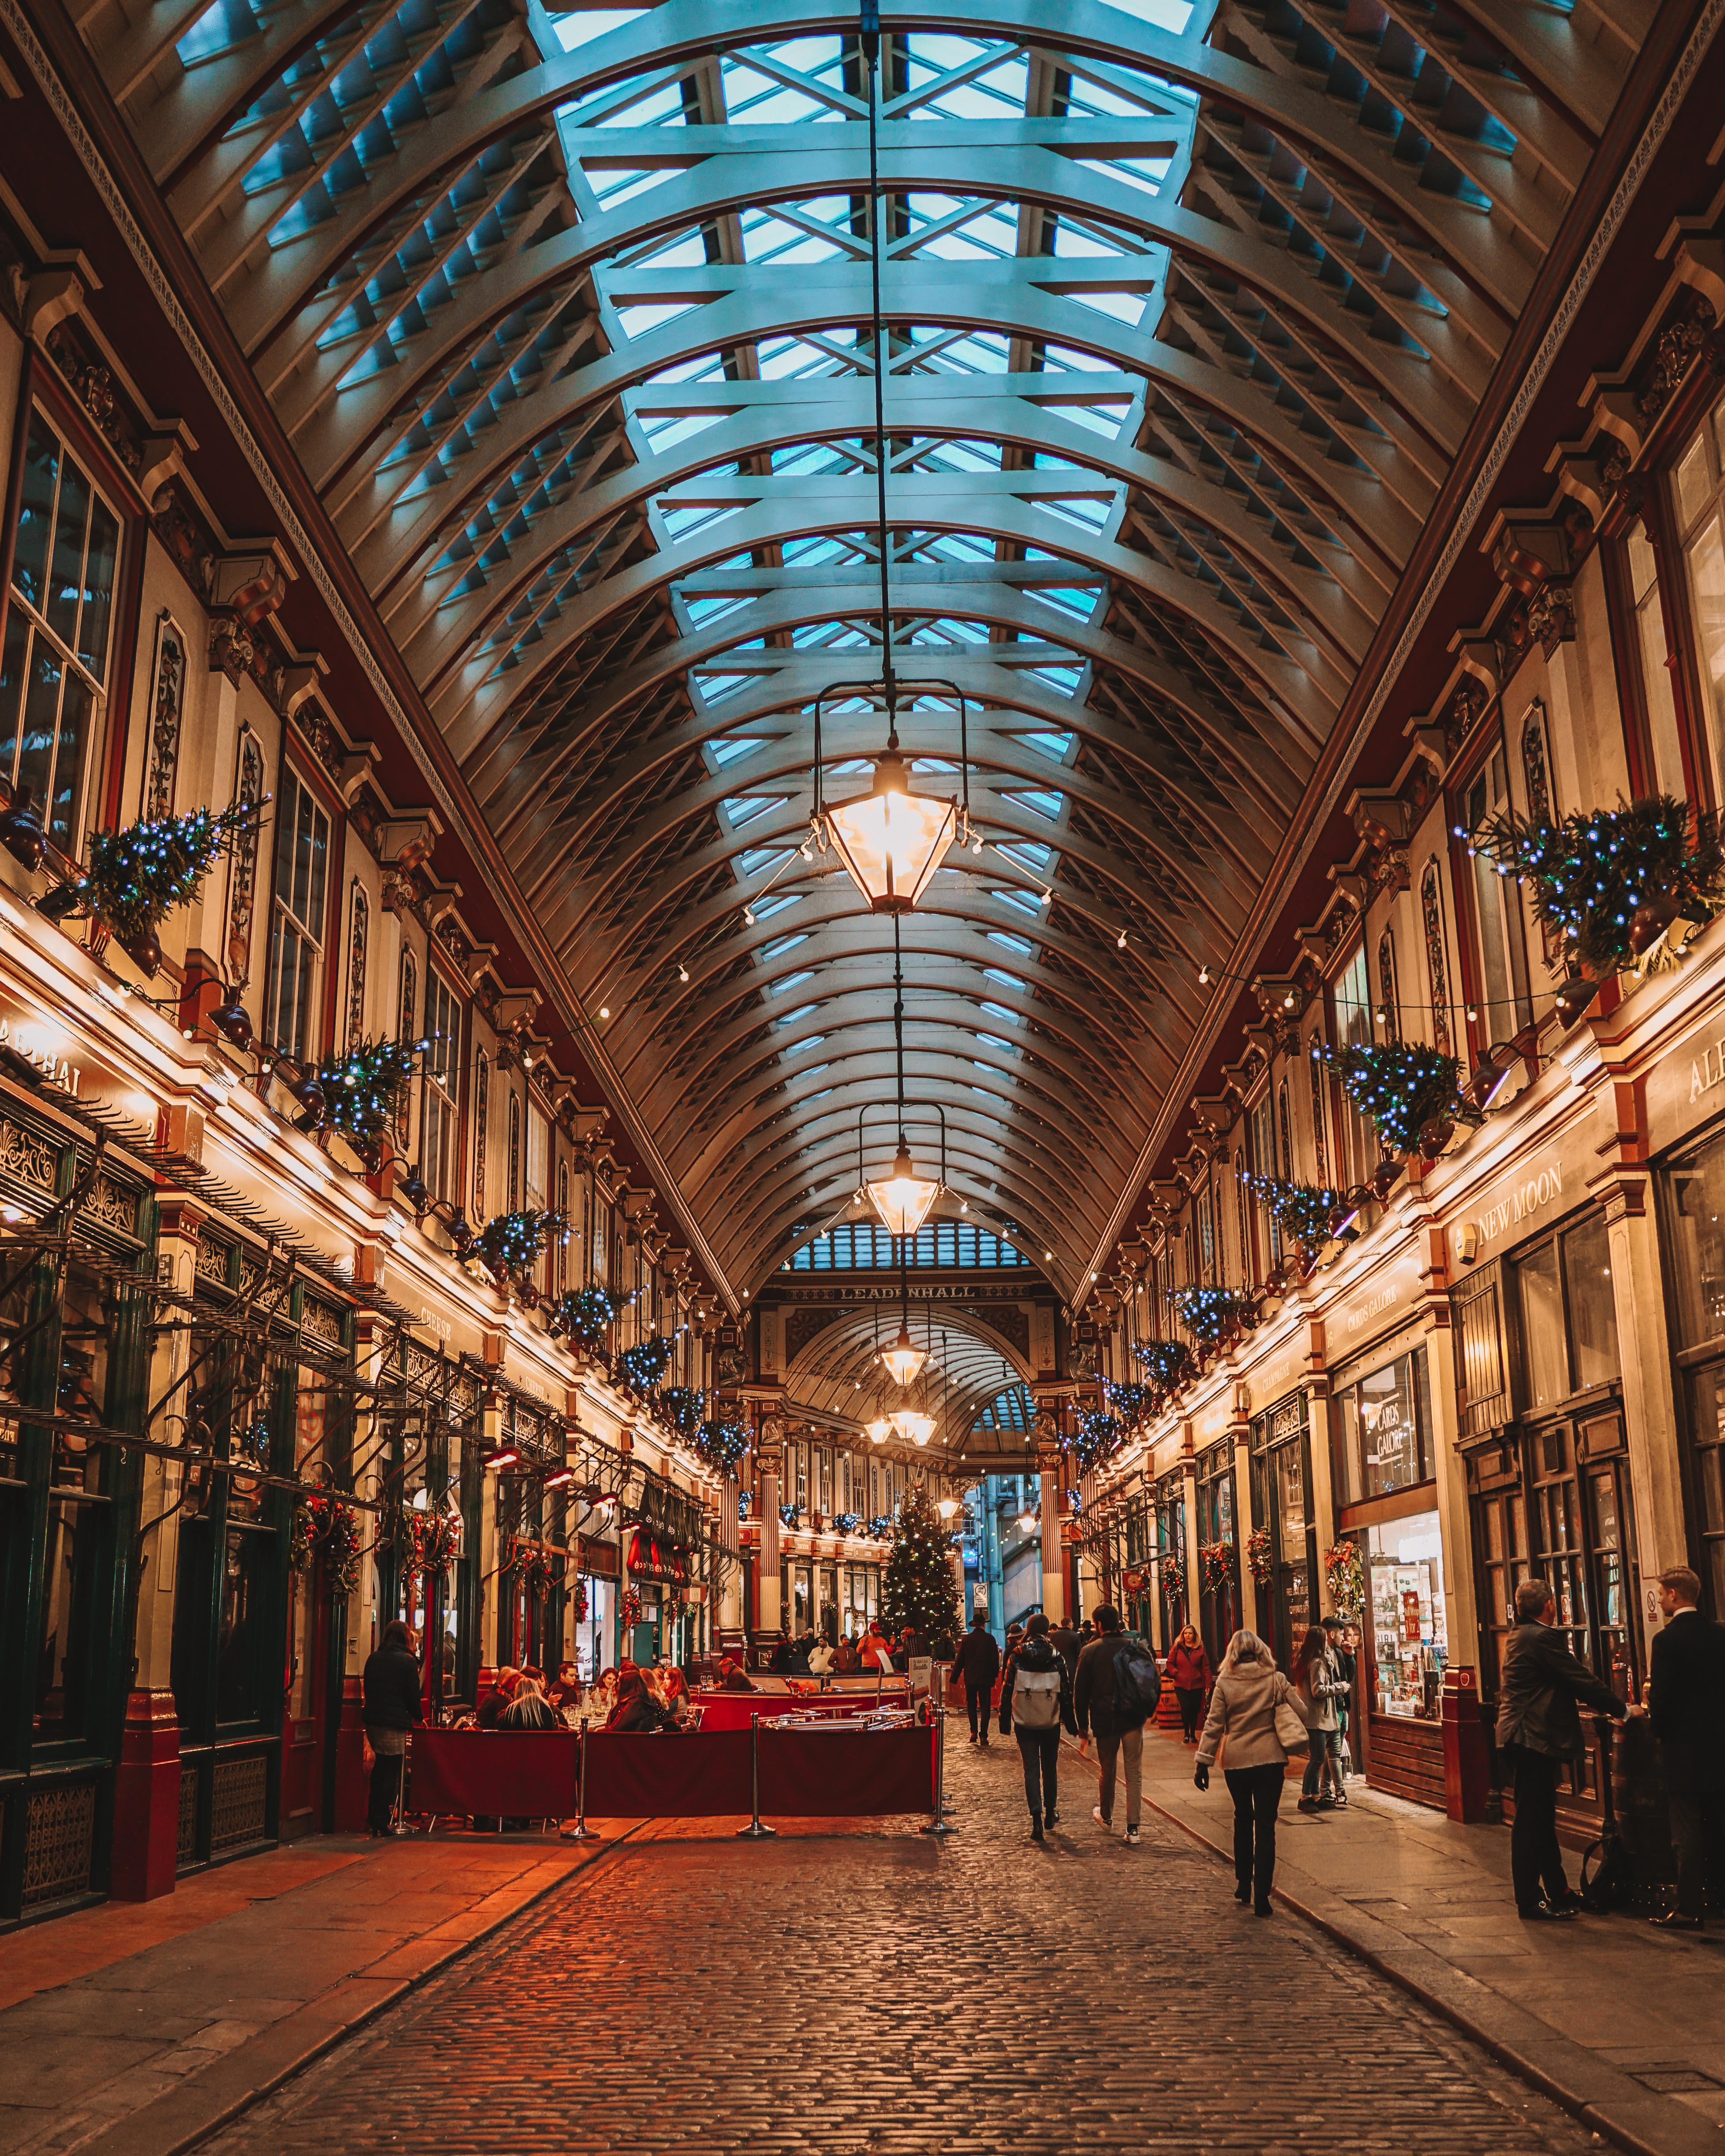 Christmas in London | London's Best Festive Displays | Leadenhall Market